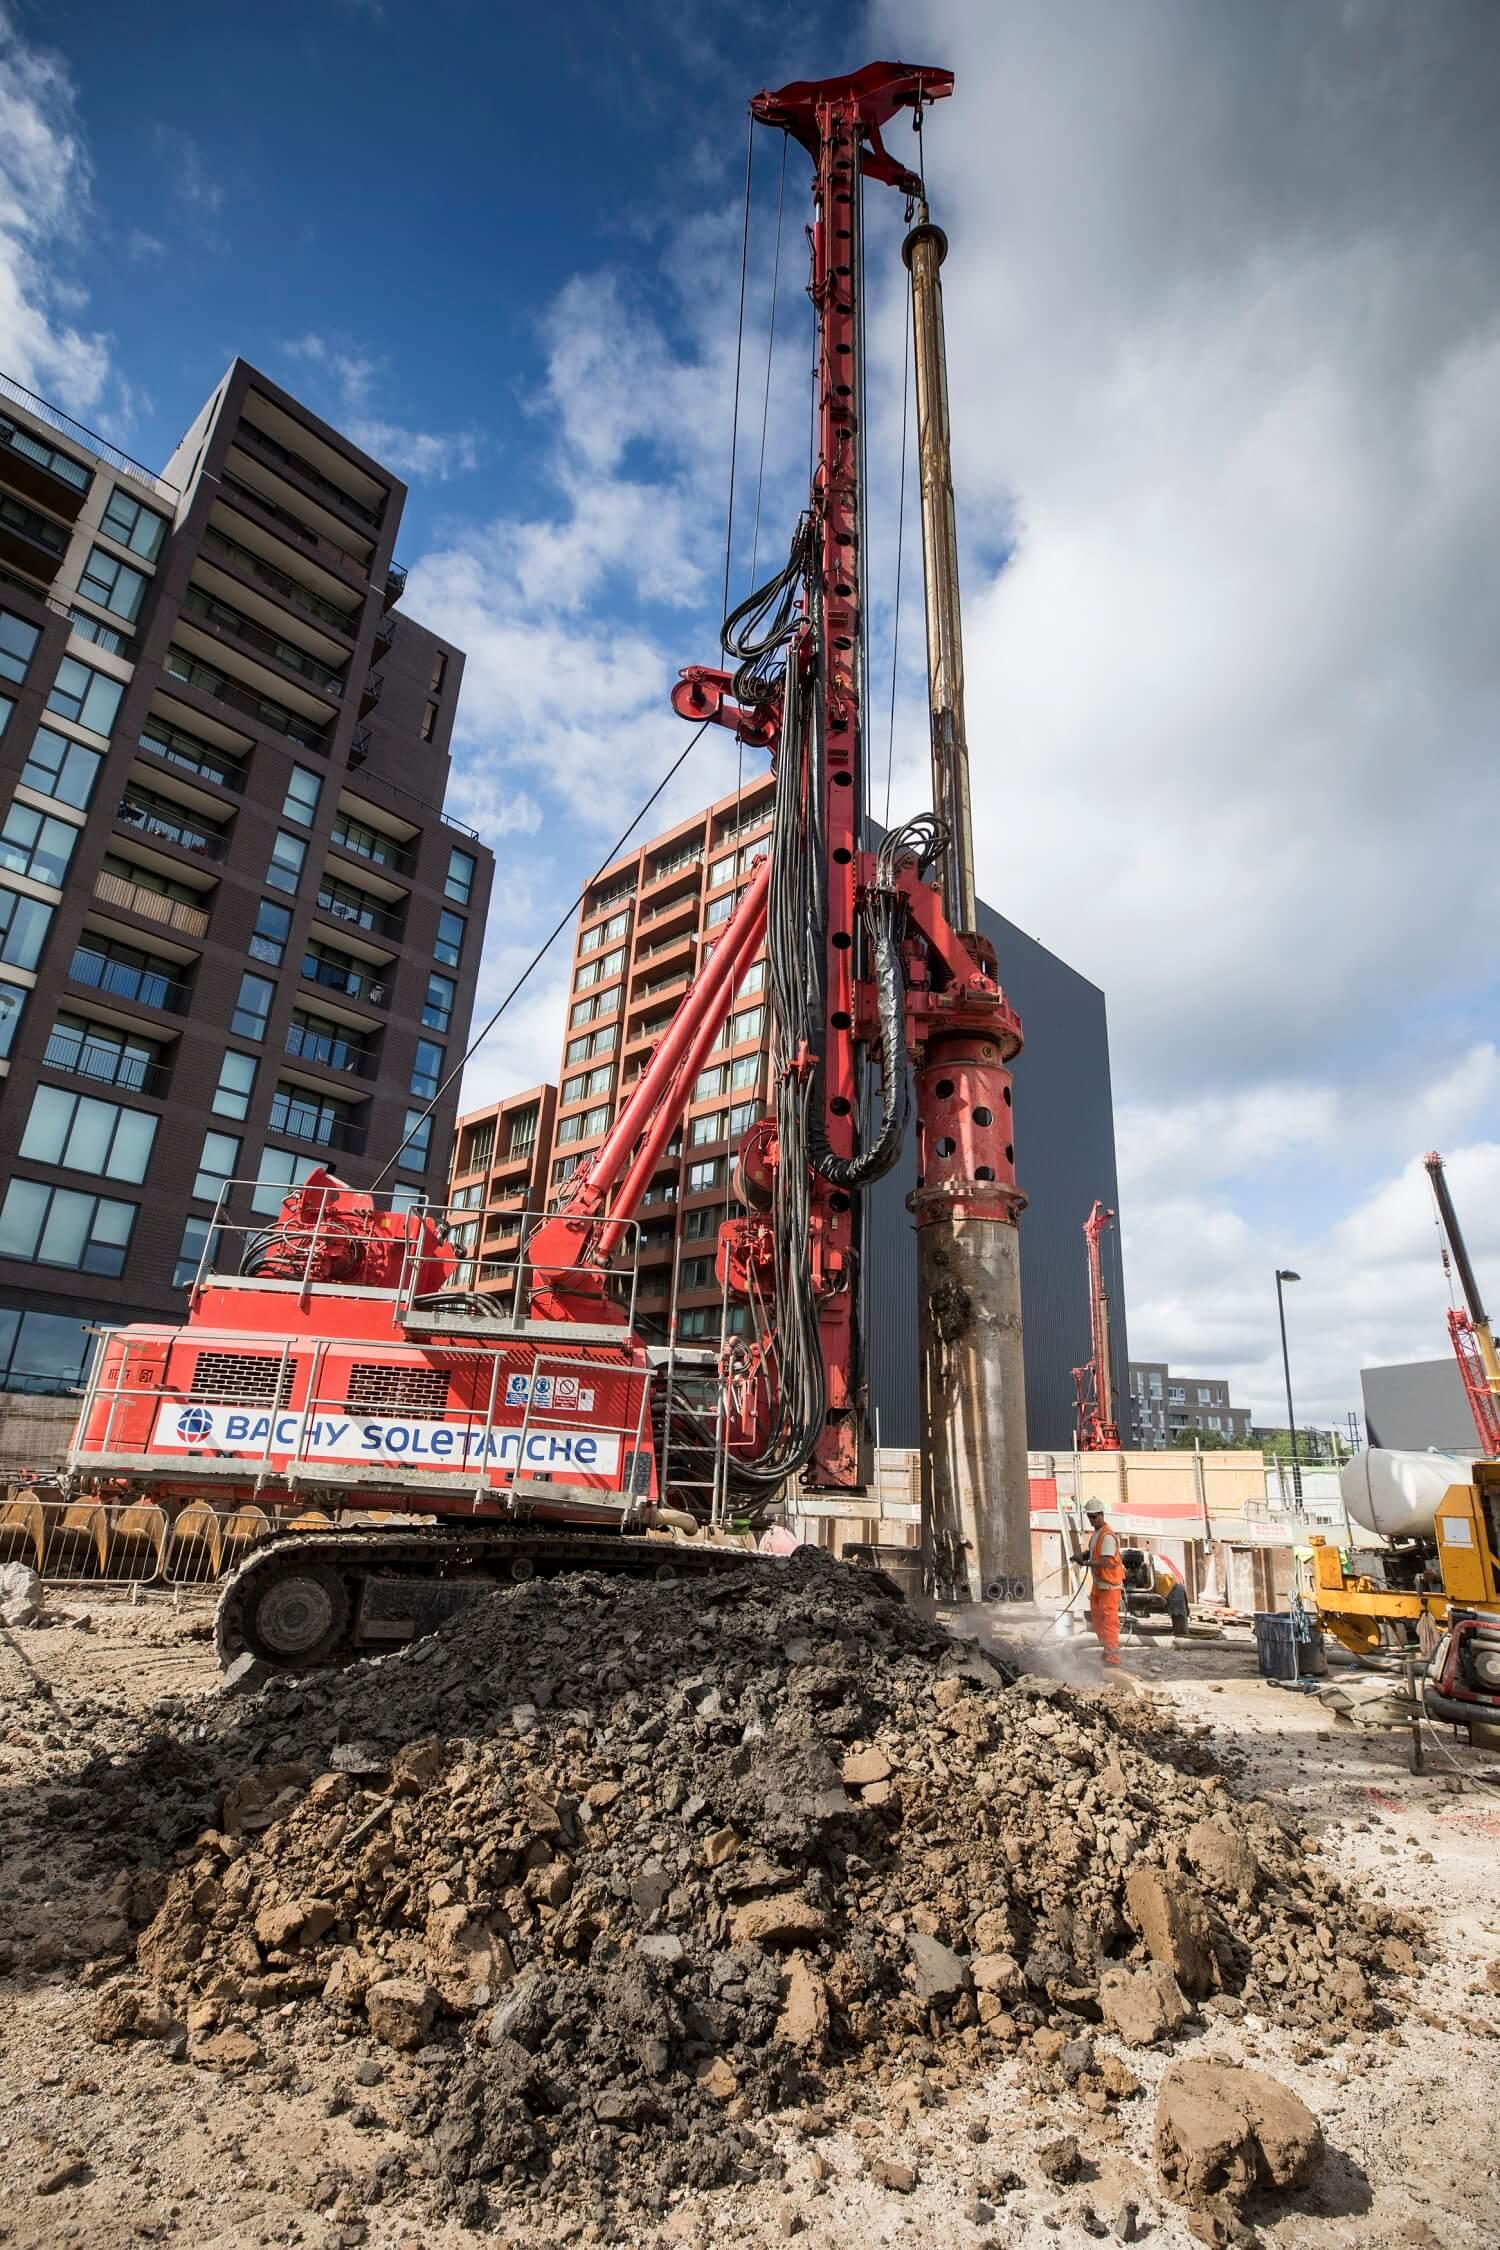 Retaining Wall Solution - Kings Cross S1 Development - Contiguous Pile Wall CFA LDA Piling (2)